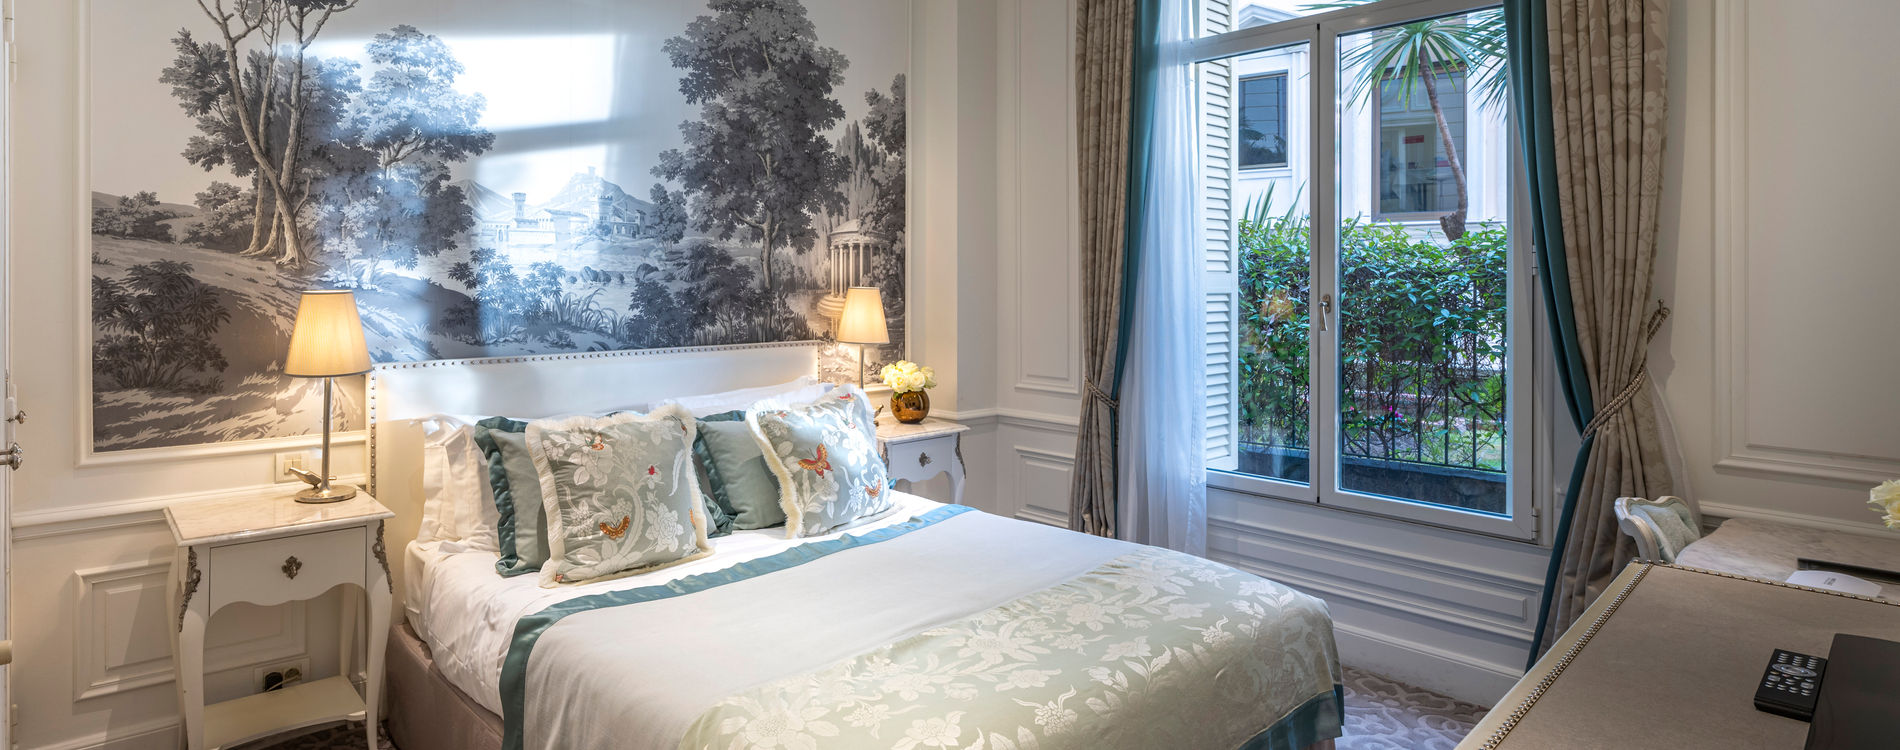 Hôtel Hermitage - Chambre Queen Supérieure